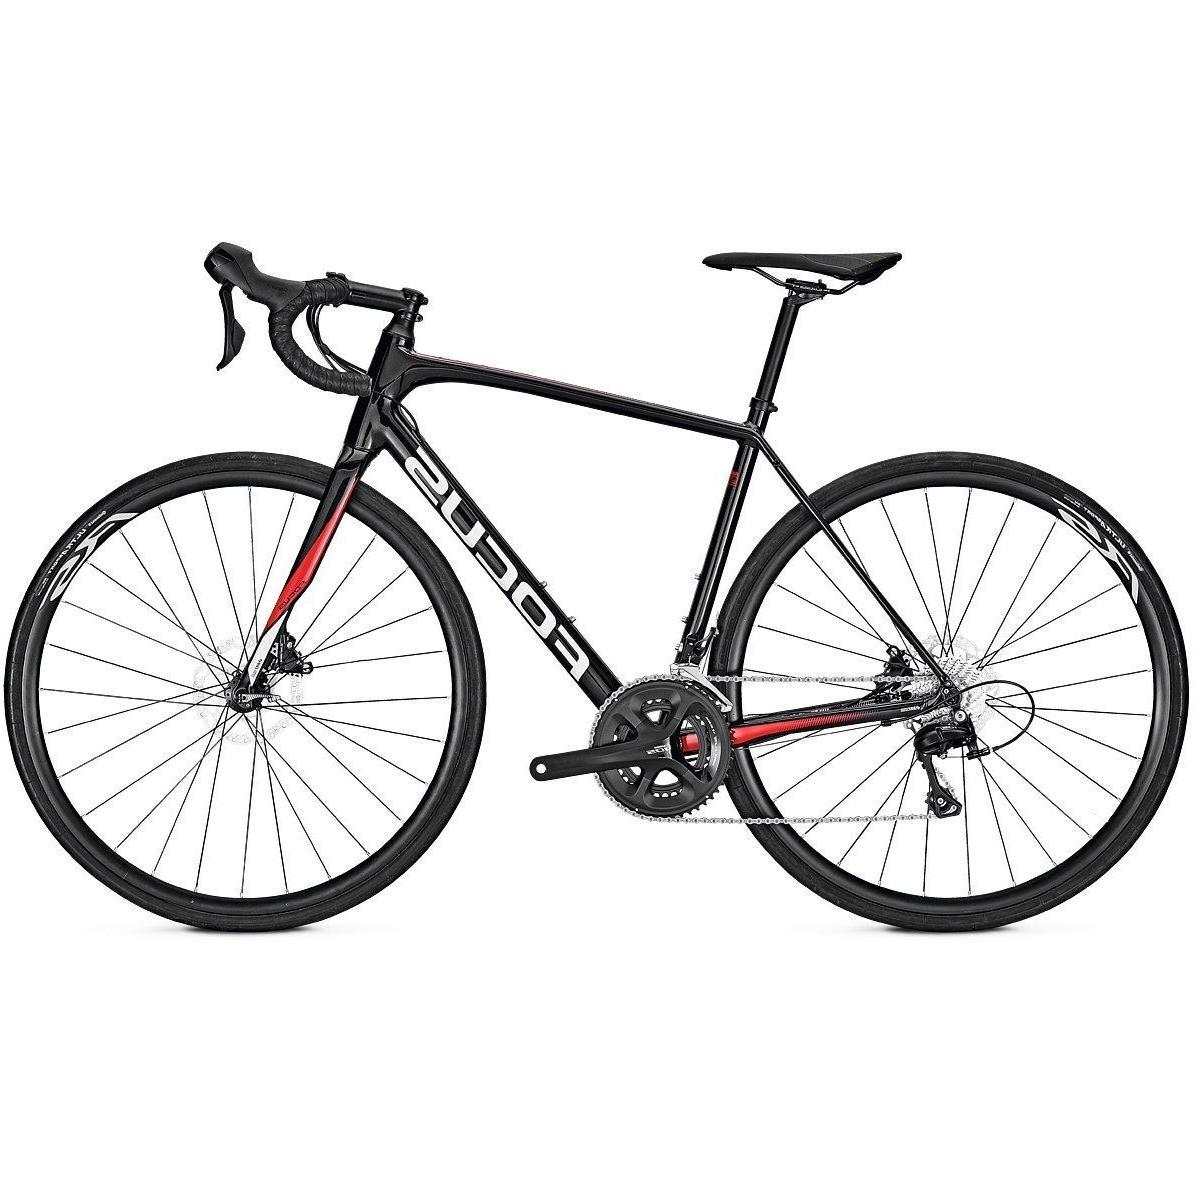 2018 paralane 105 disc carbon road bike